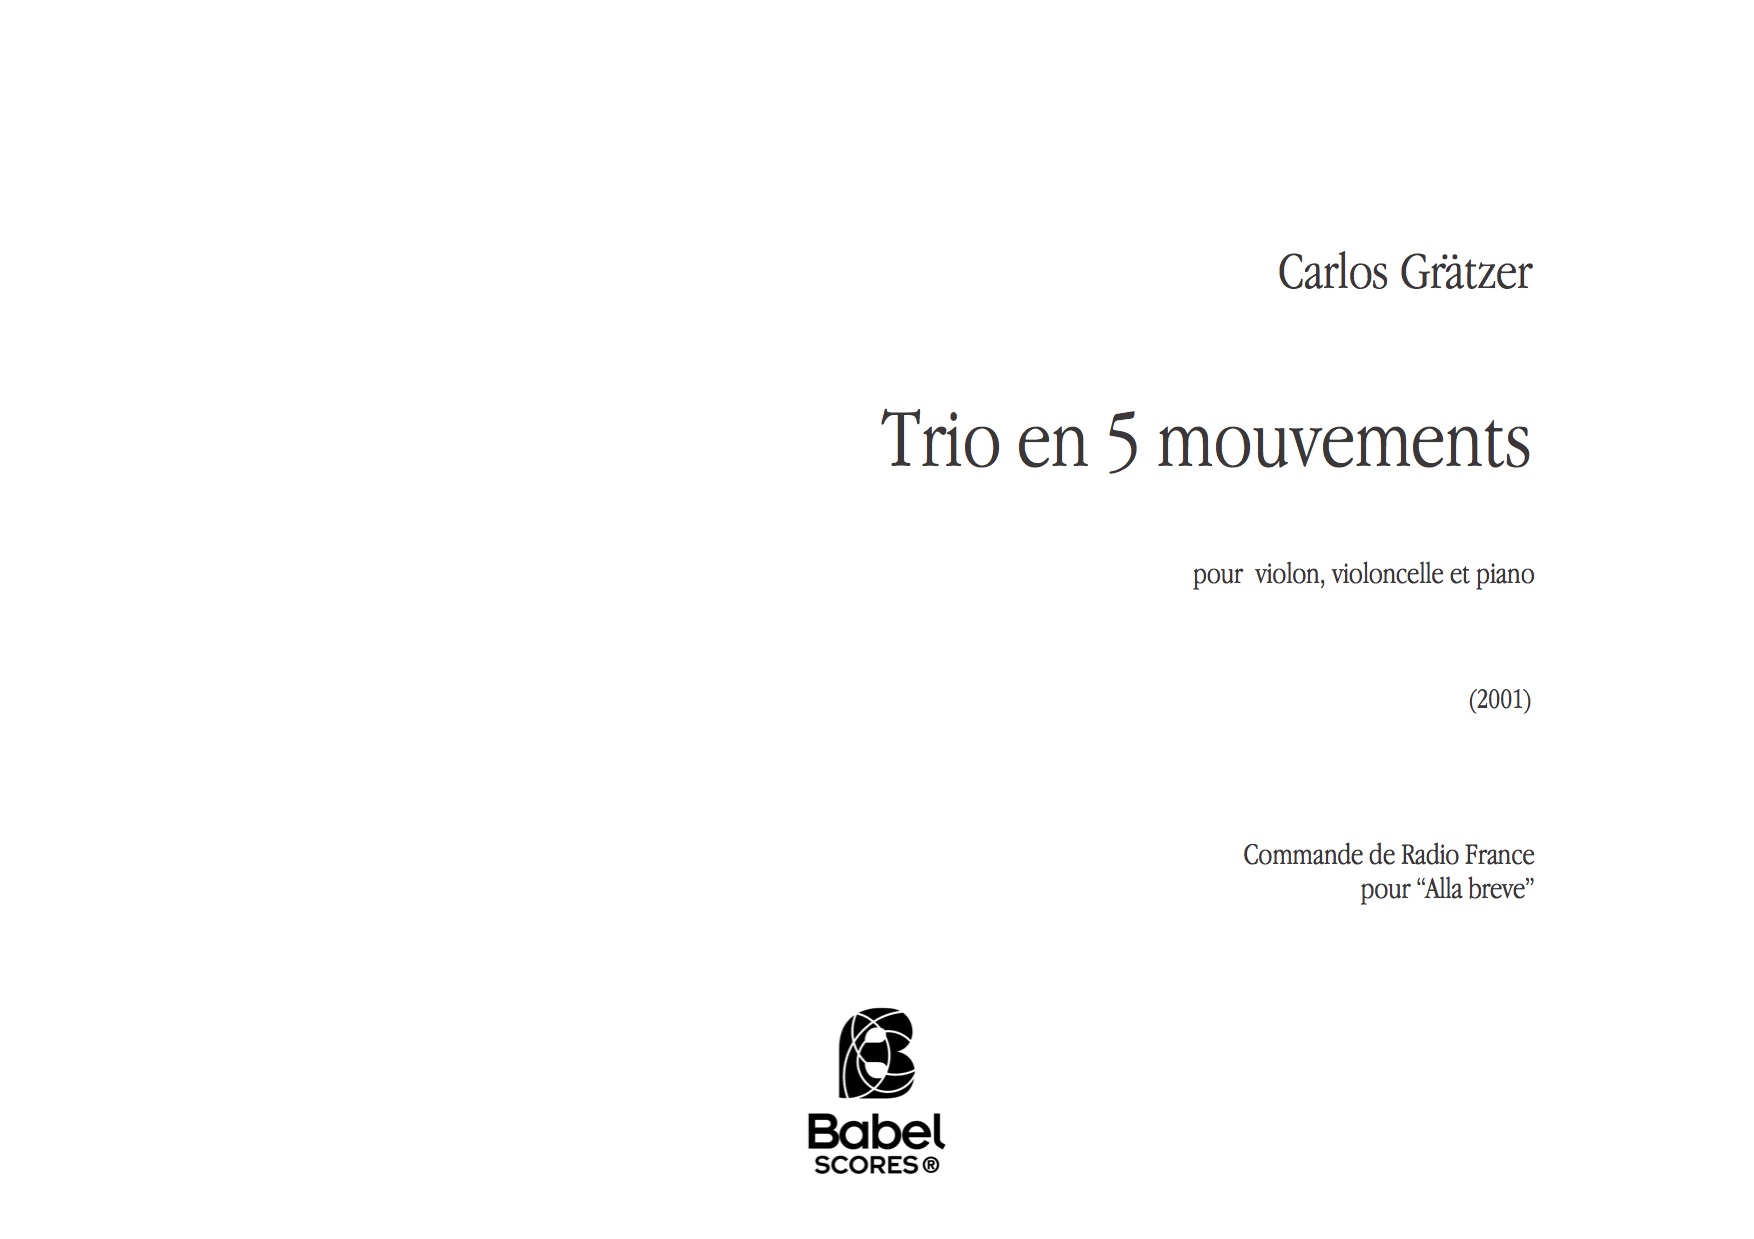 Trio en cinq mouvements